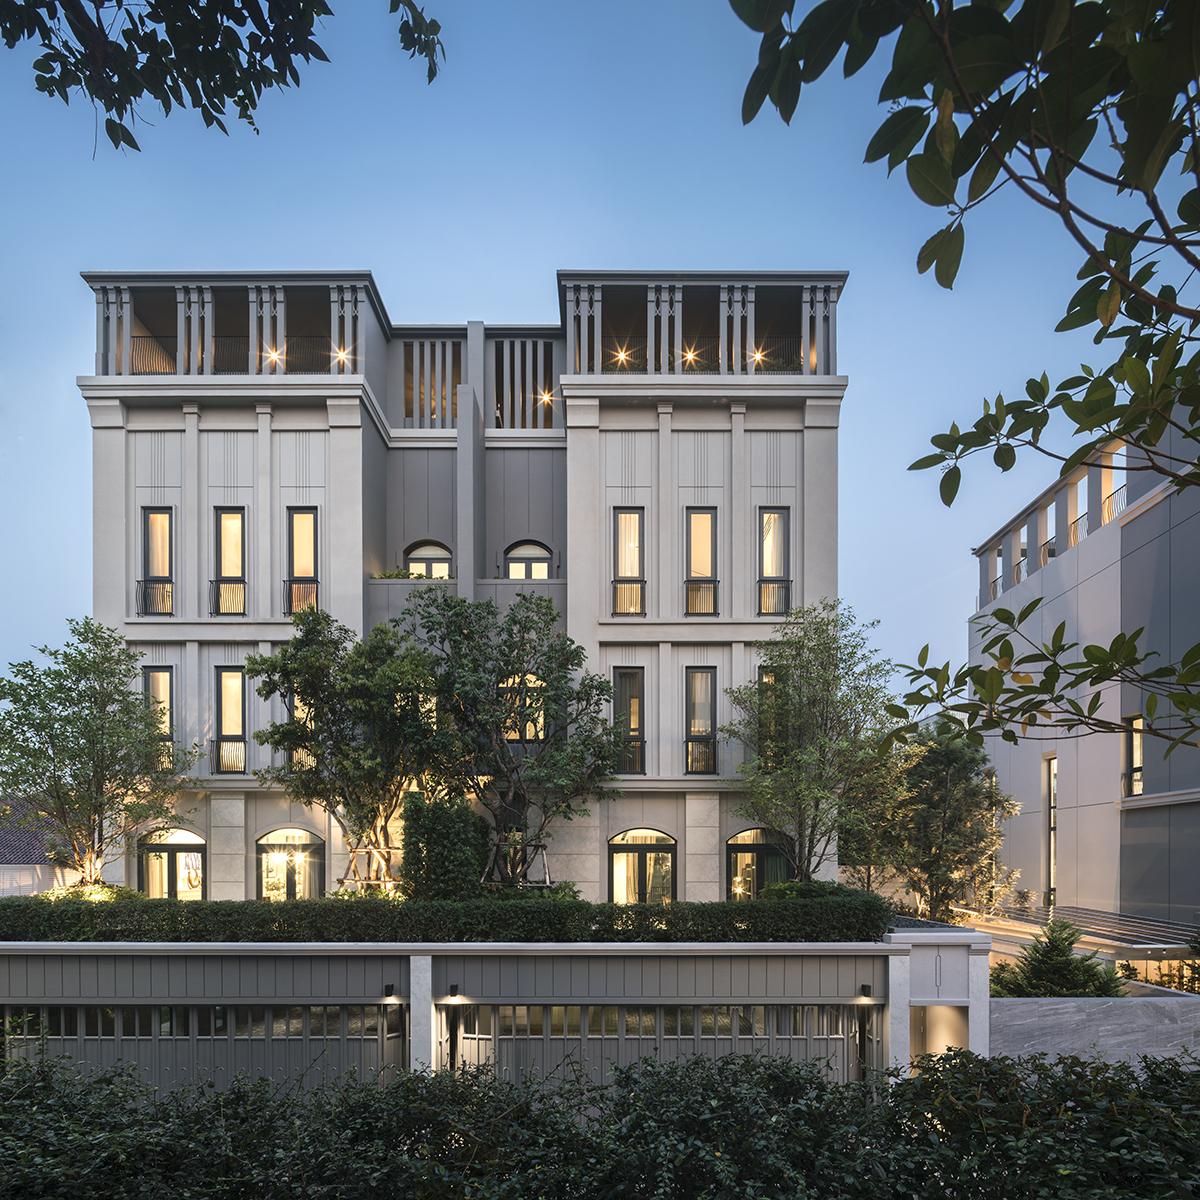 Malton Private Residences Ari บ้านเดี่ยวระดับ Super Luxury ในซอยพหลโยธิน 8 (สายลม) ใกล้ BTS อารีย์ จาก Major Development [PREVIEW]